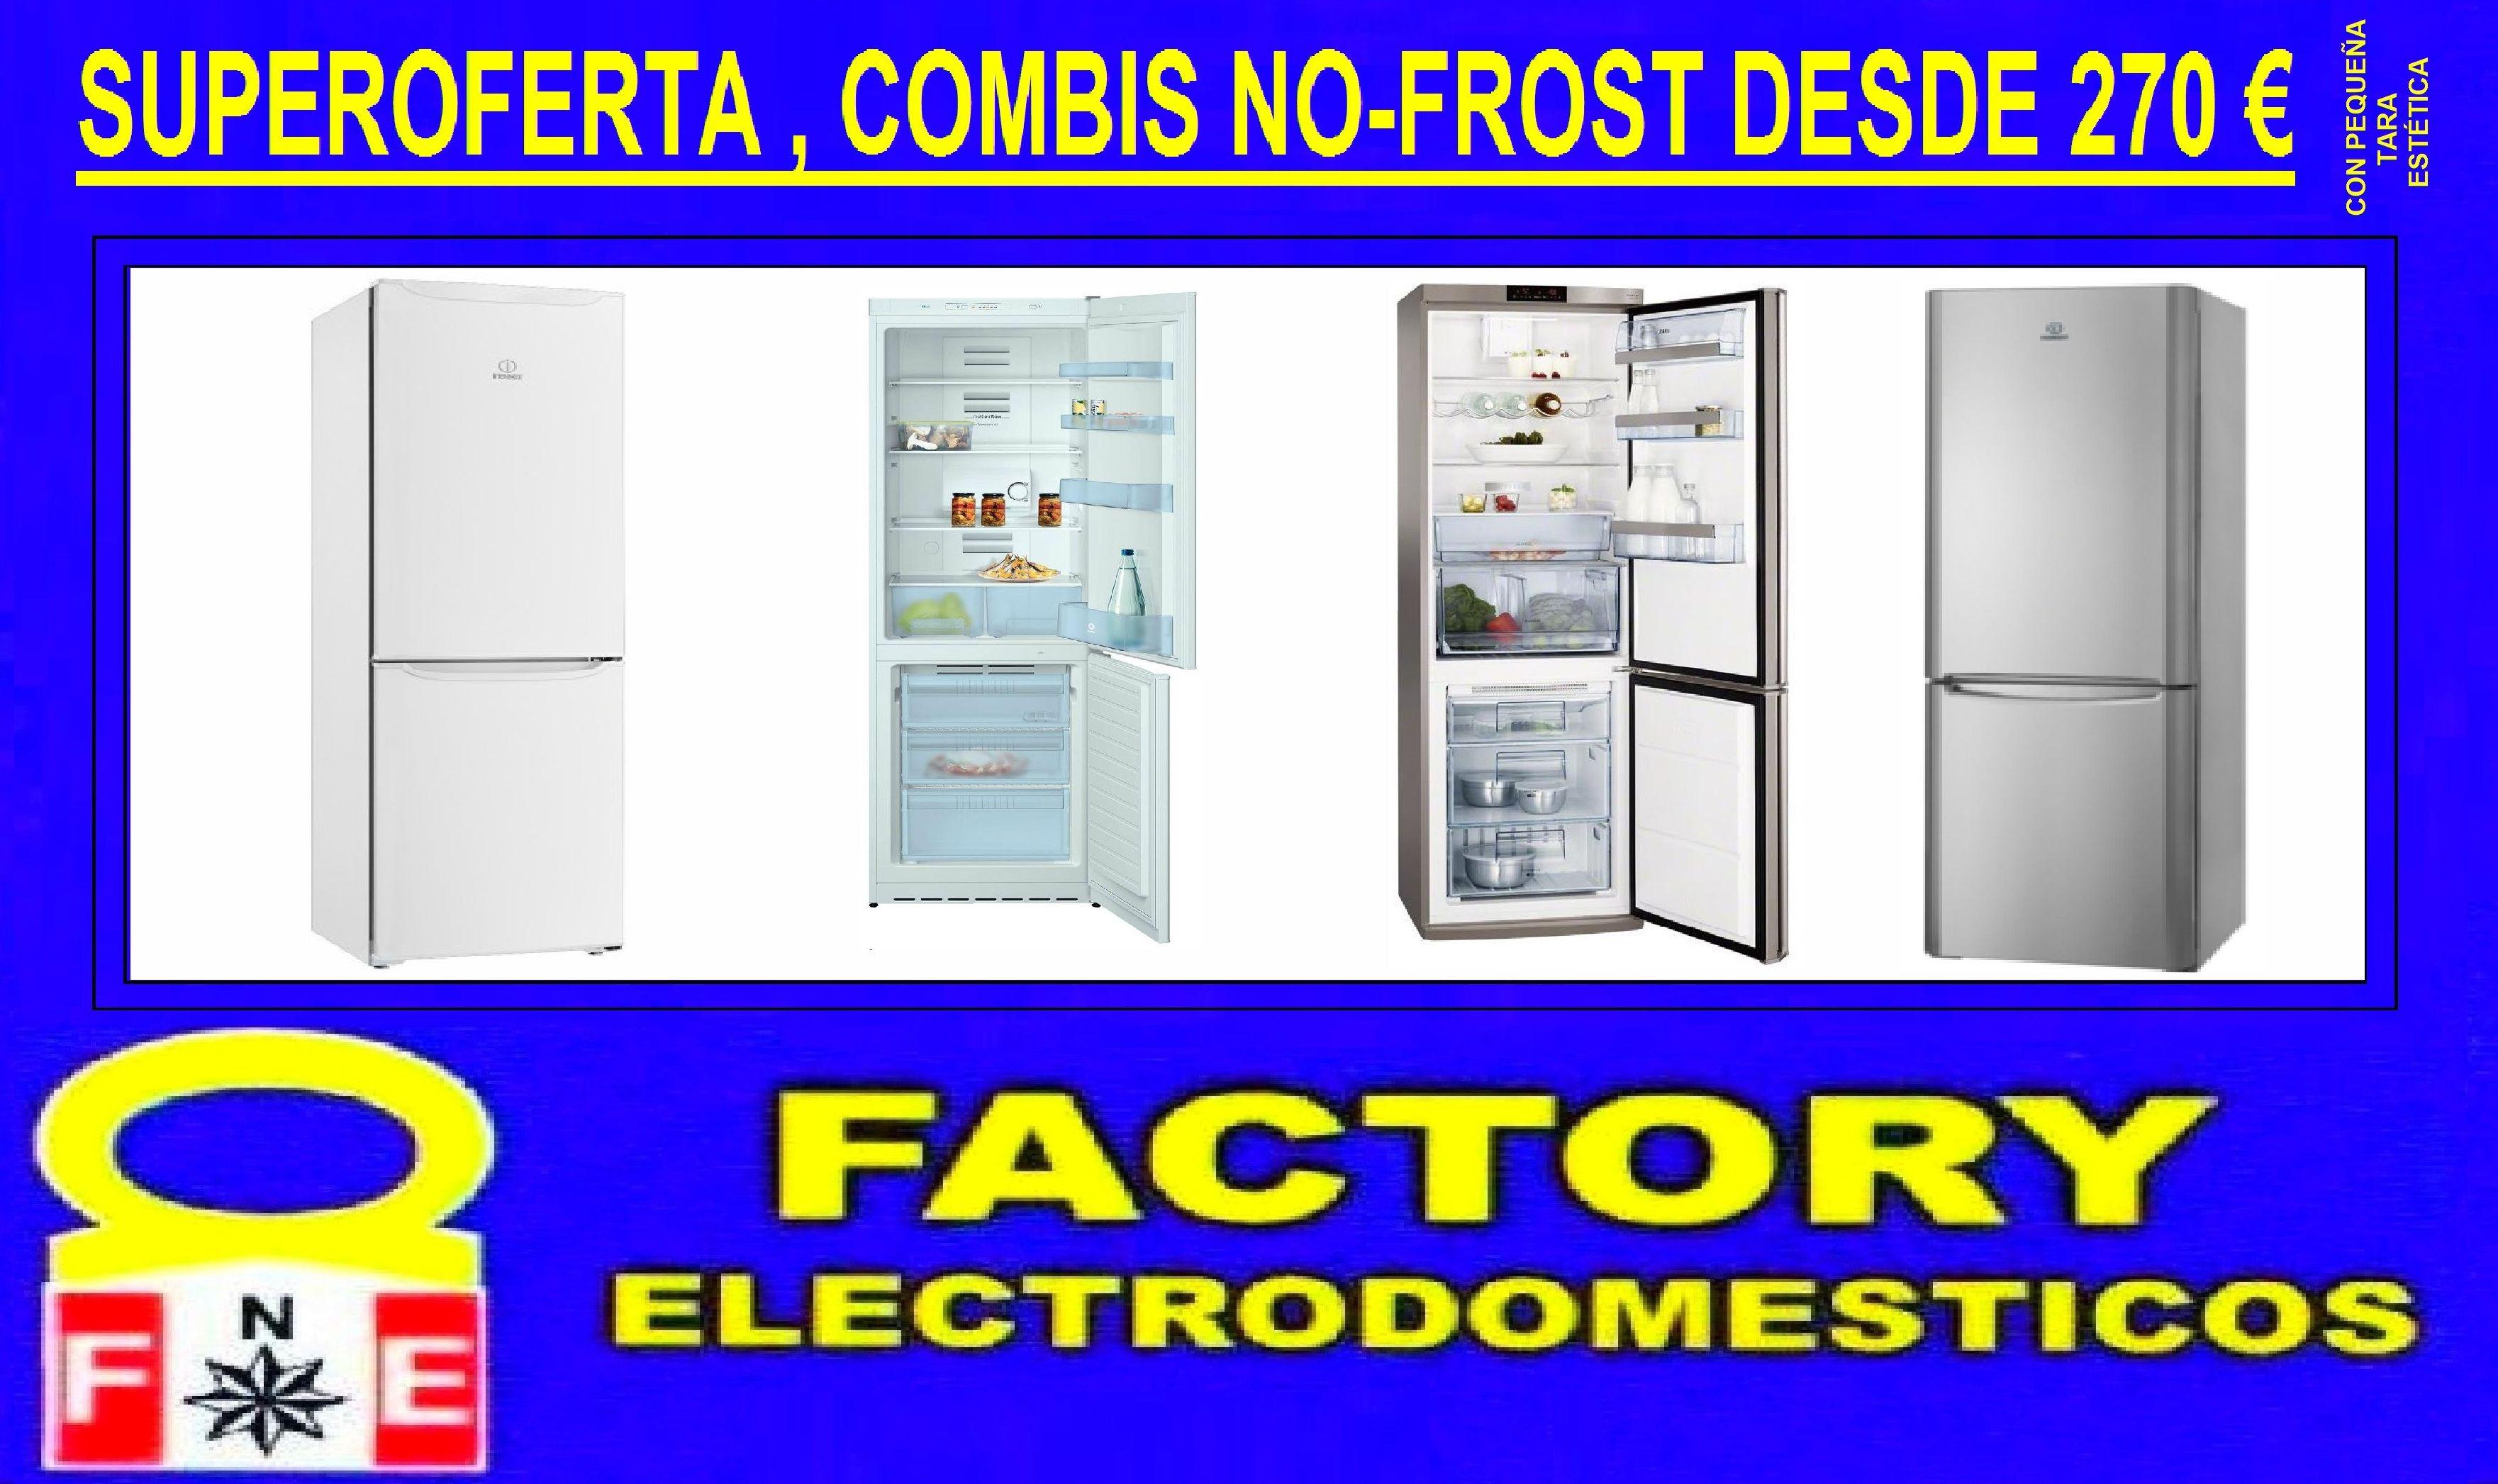 1 L SUPEROFERTA , COMBIS NO-FROST DESDE 270 € (con pequeña tara estética): OFERTAS de Factory Electrodomésticos Arco Norte